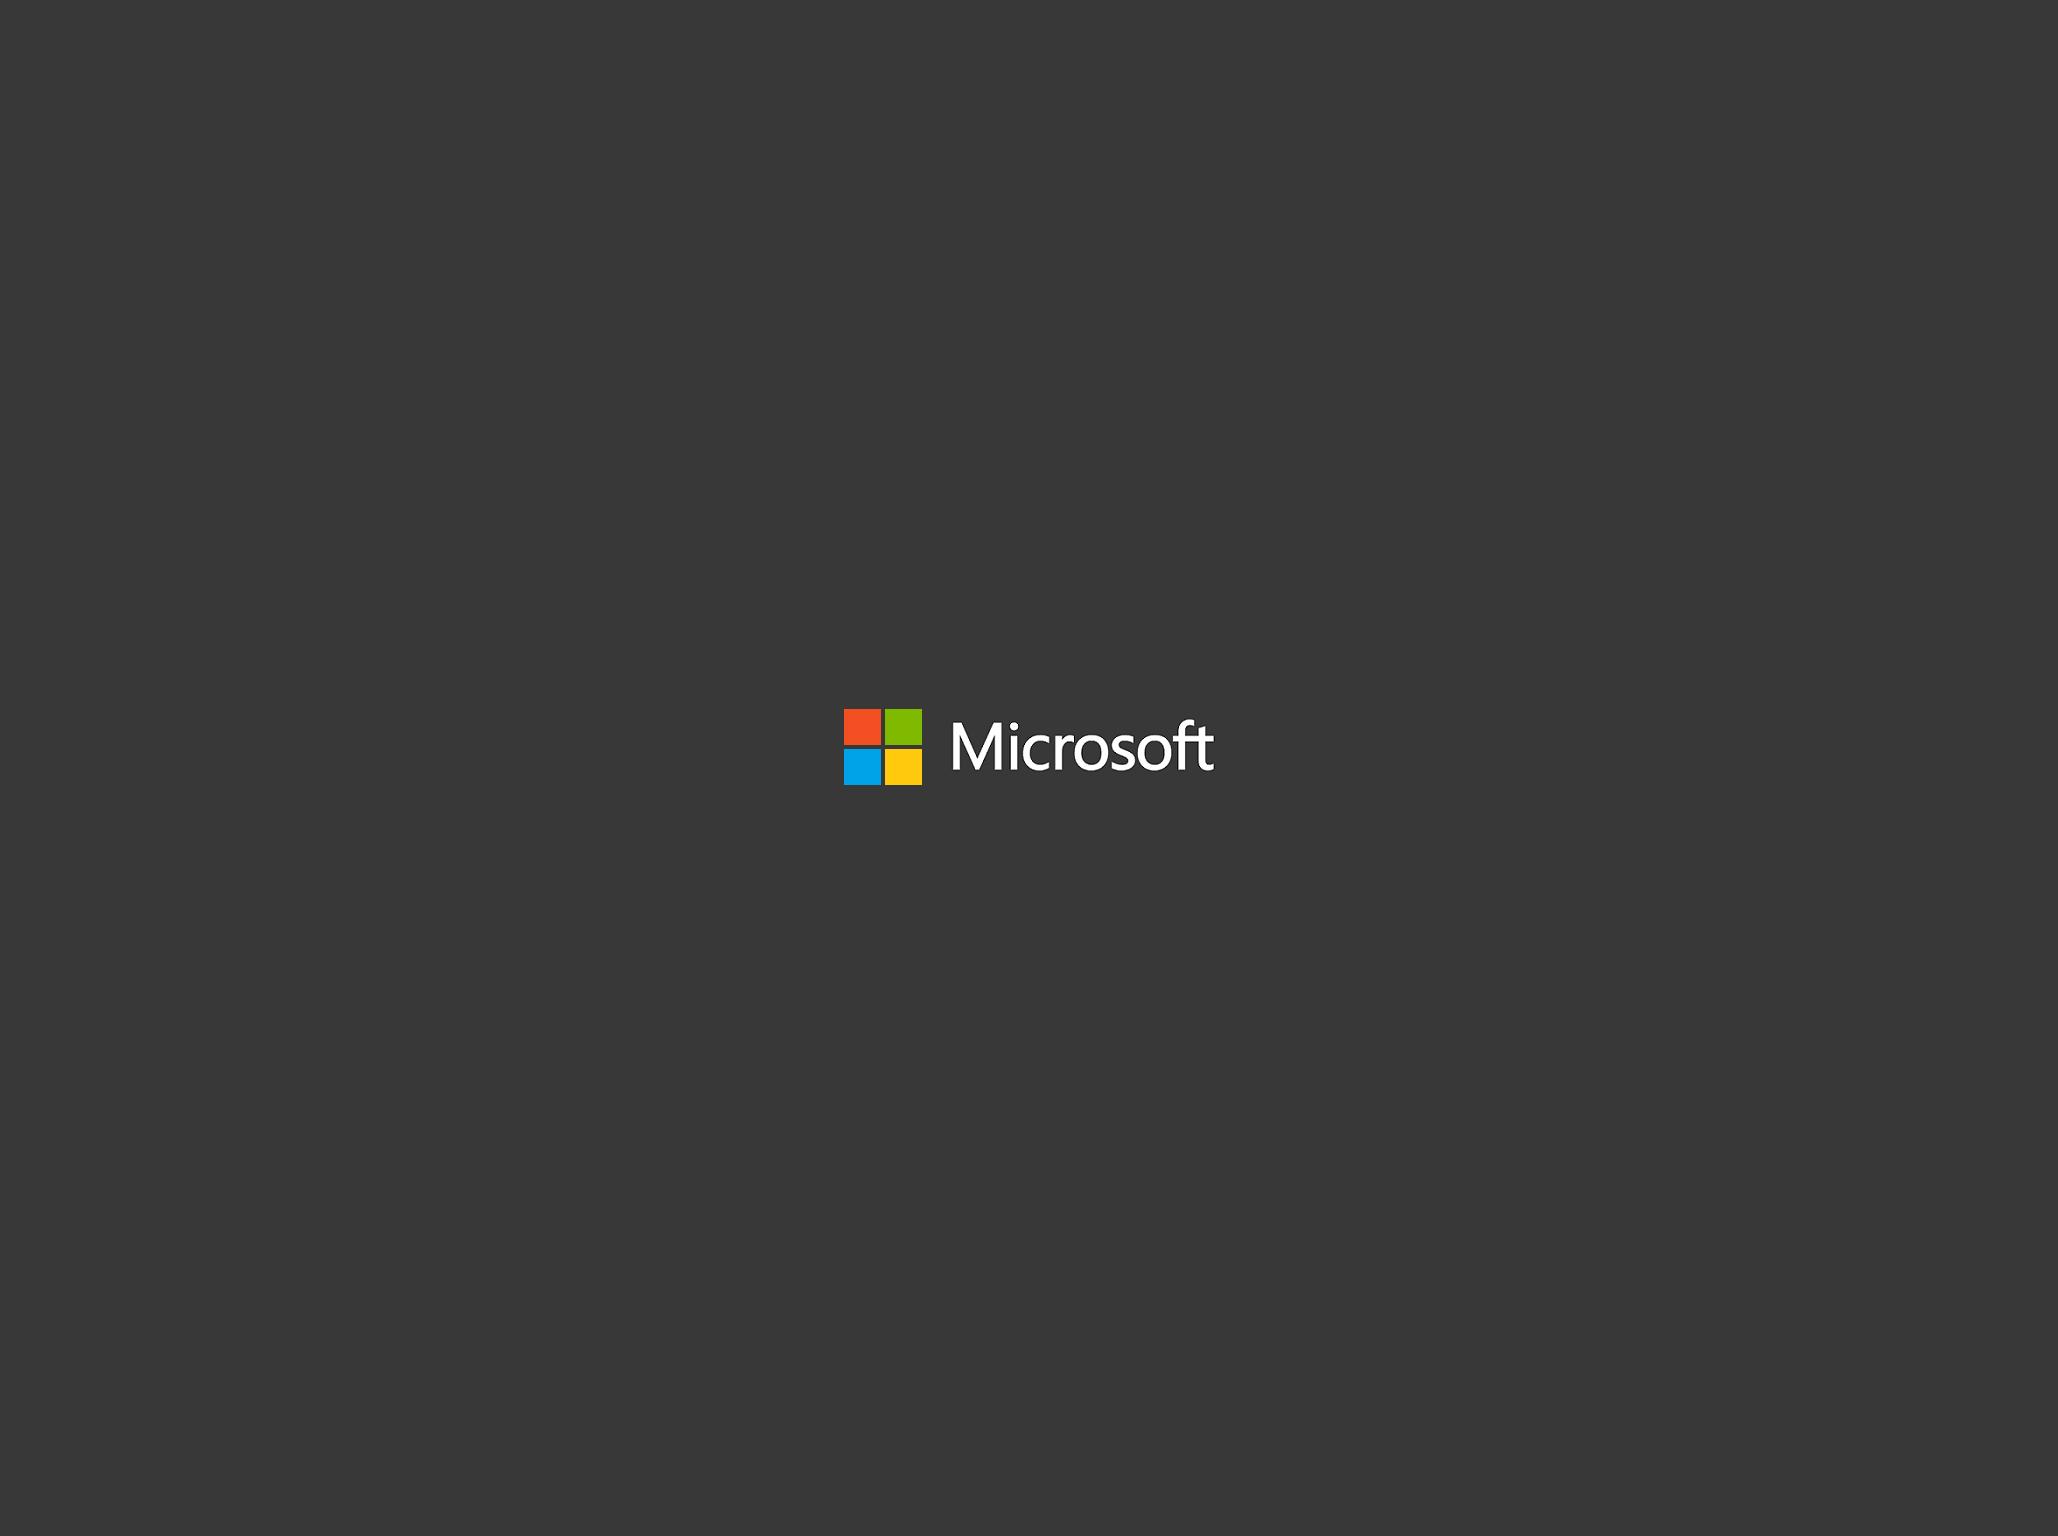 New Microsoft Logo Images TheCelebrityPix 2058x1536